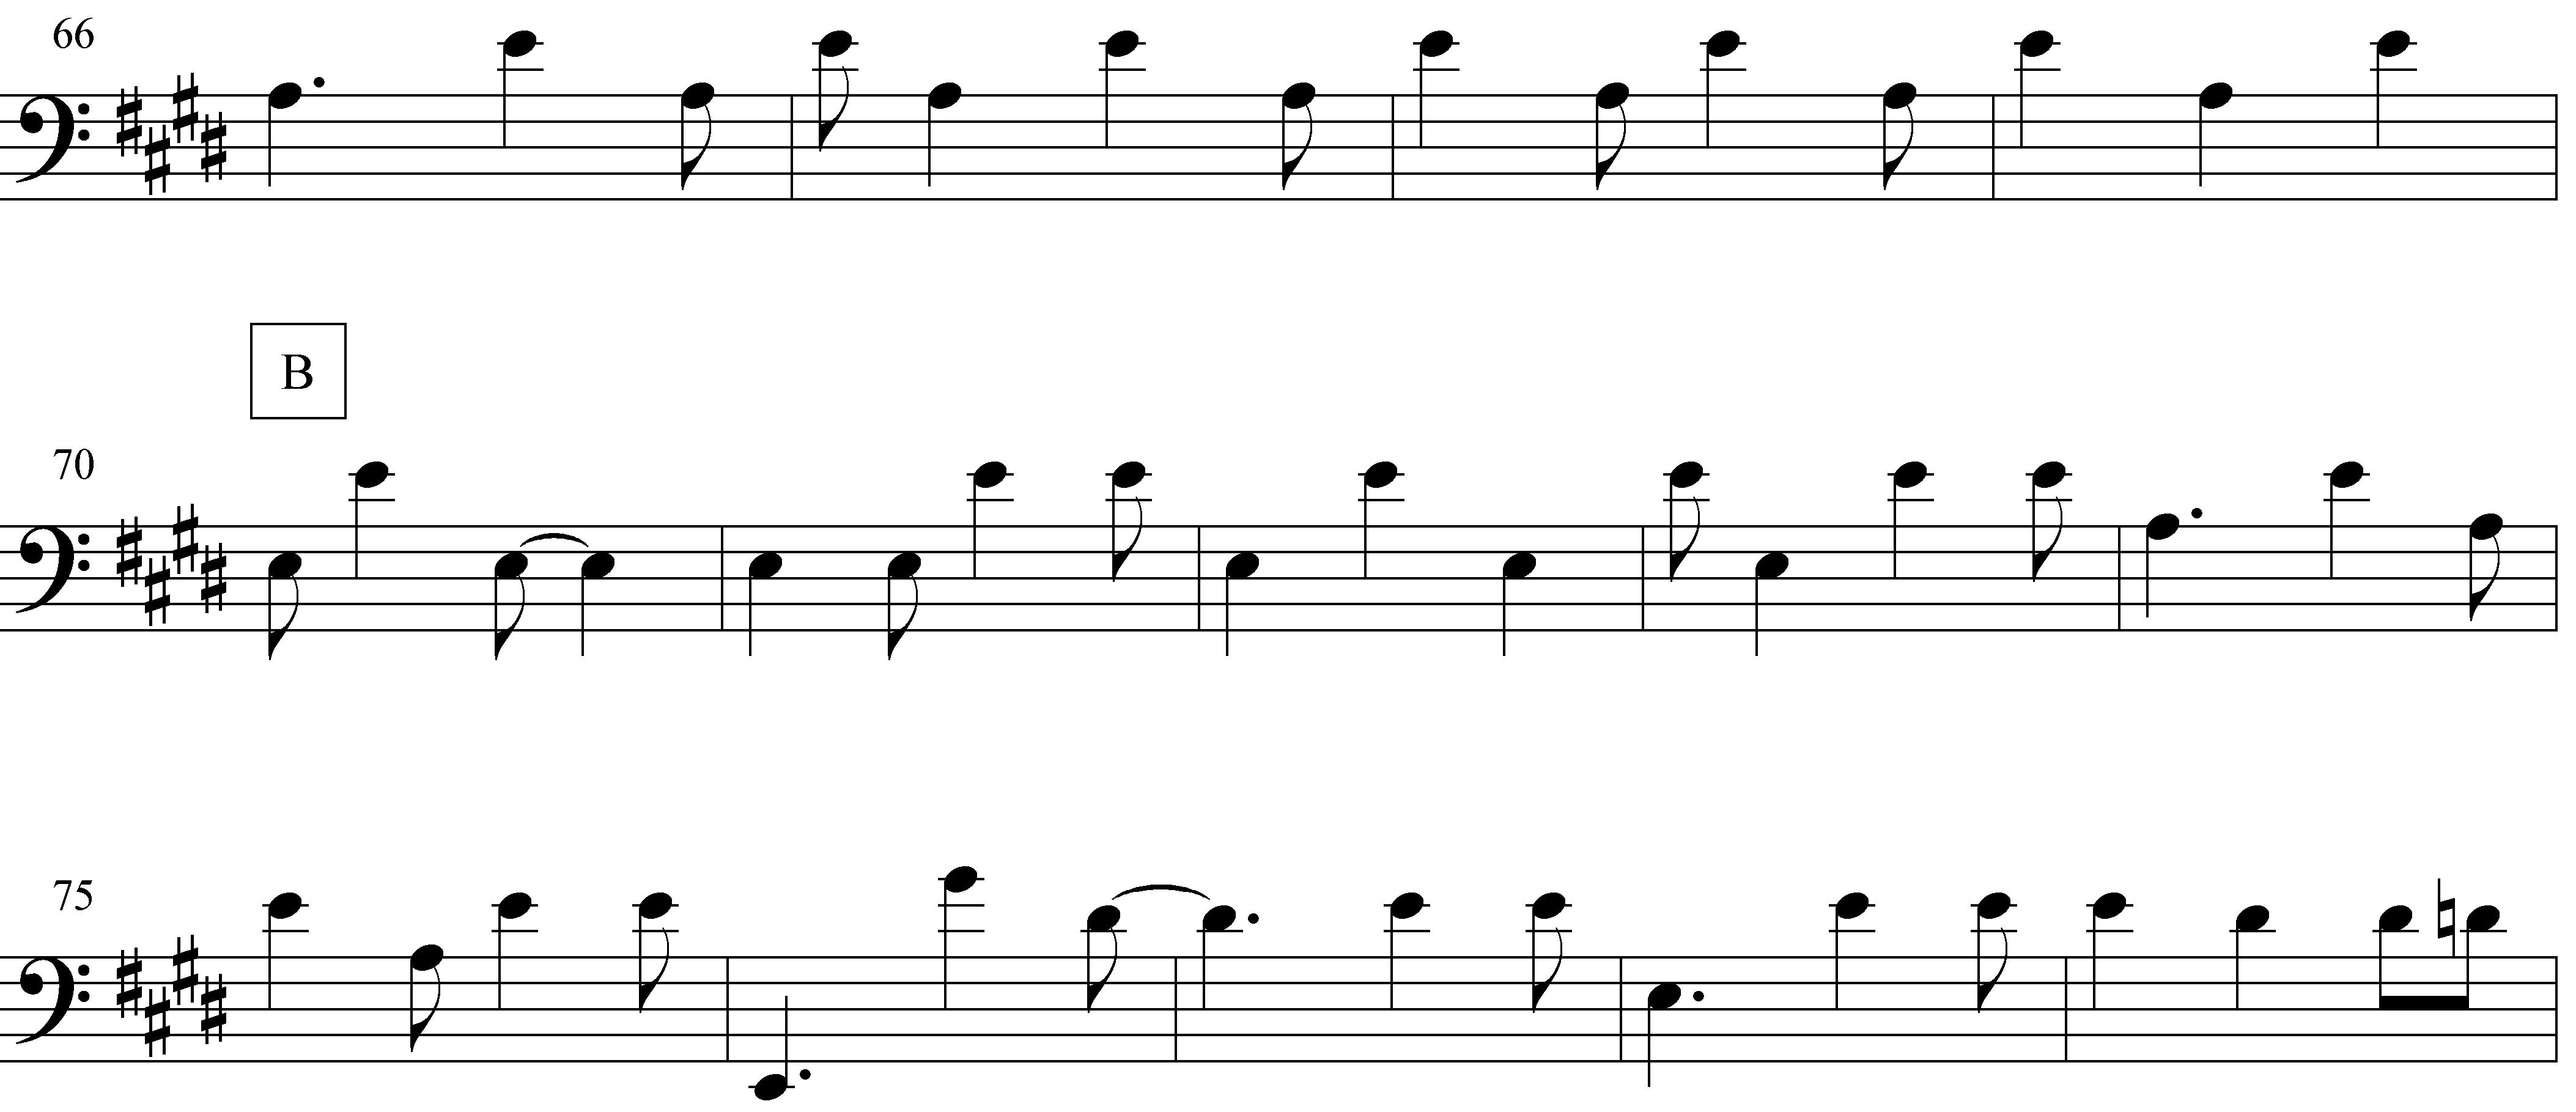 A3-into-B3